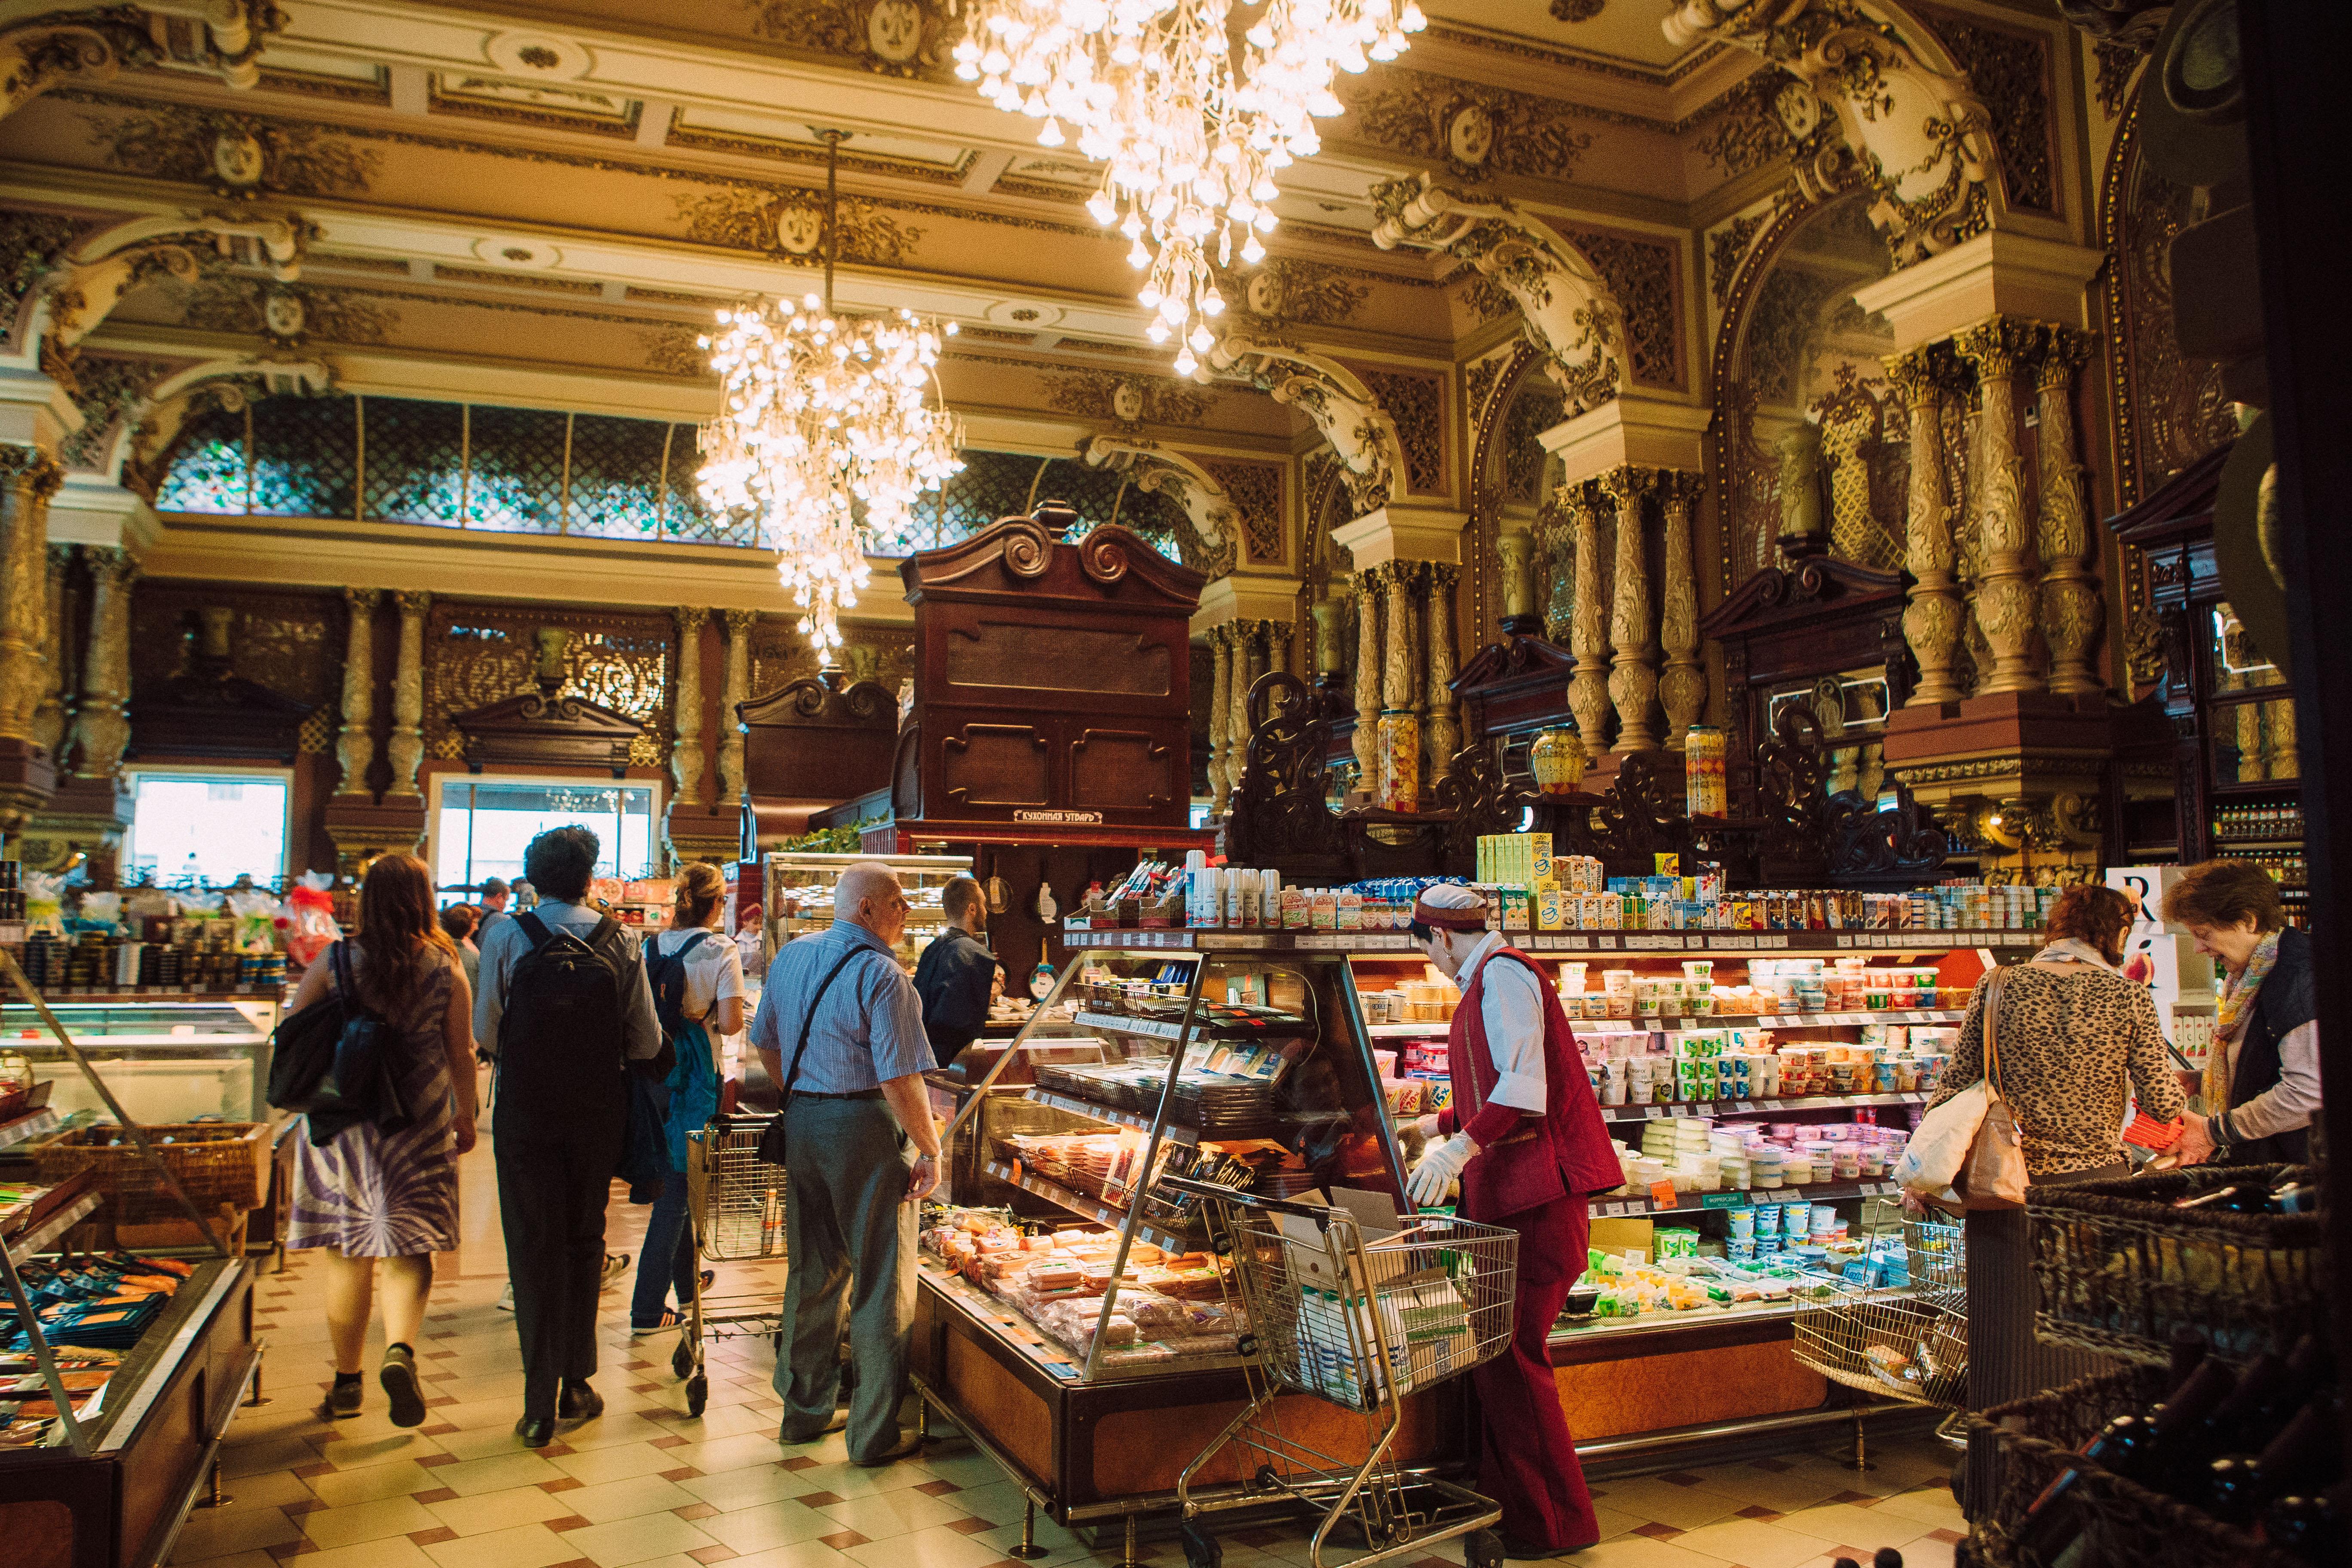 Eliseevsky store